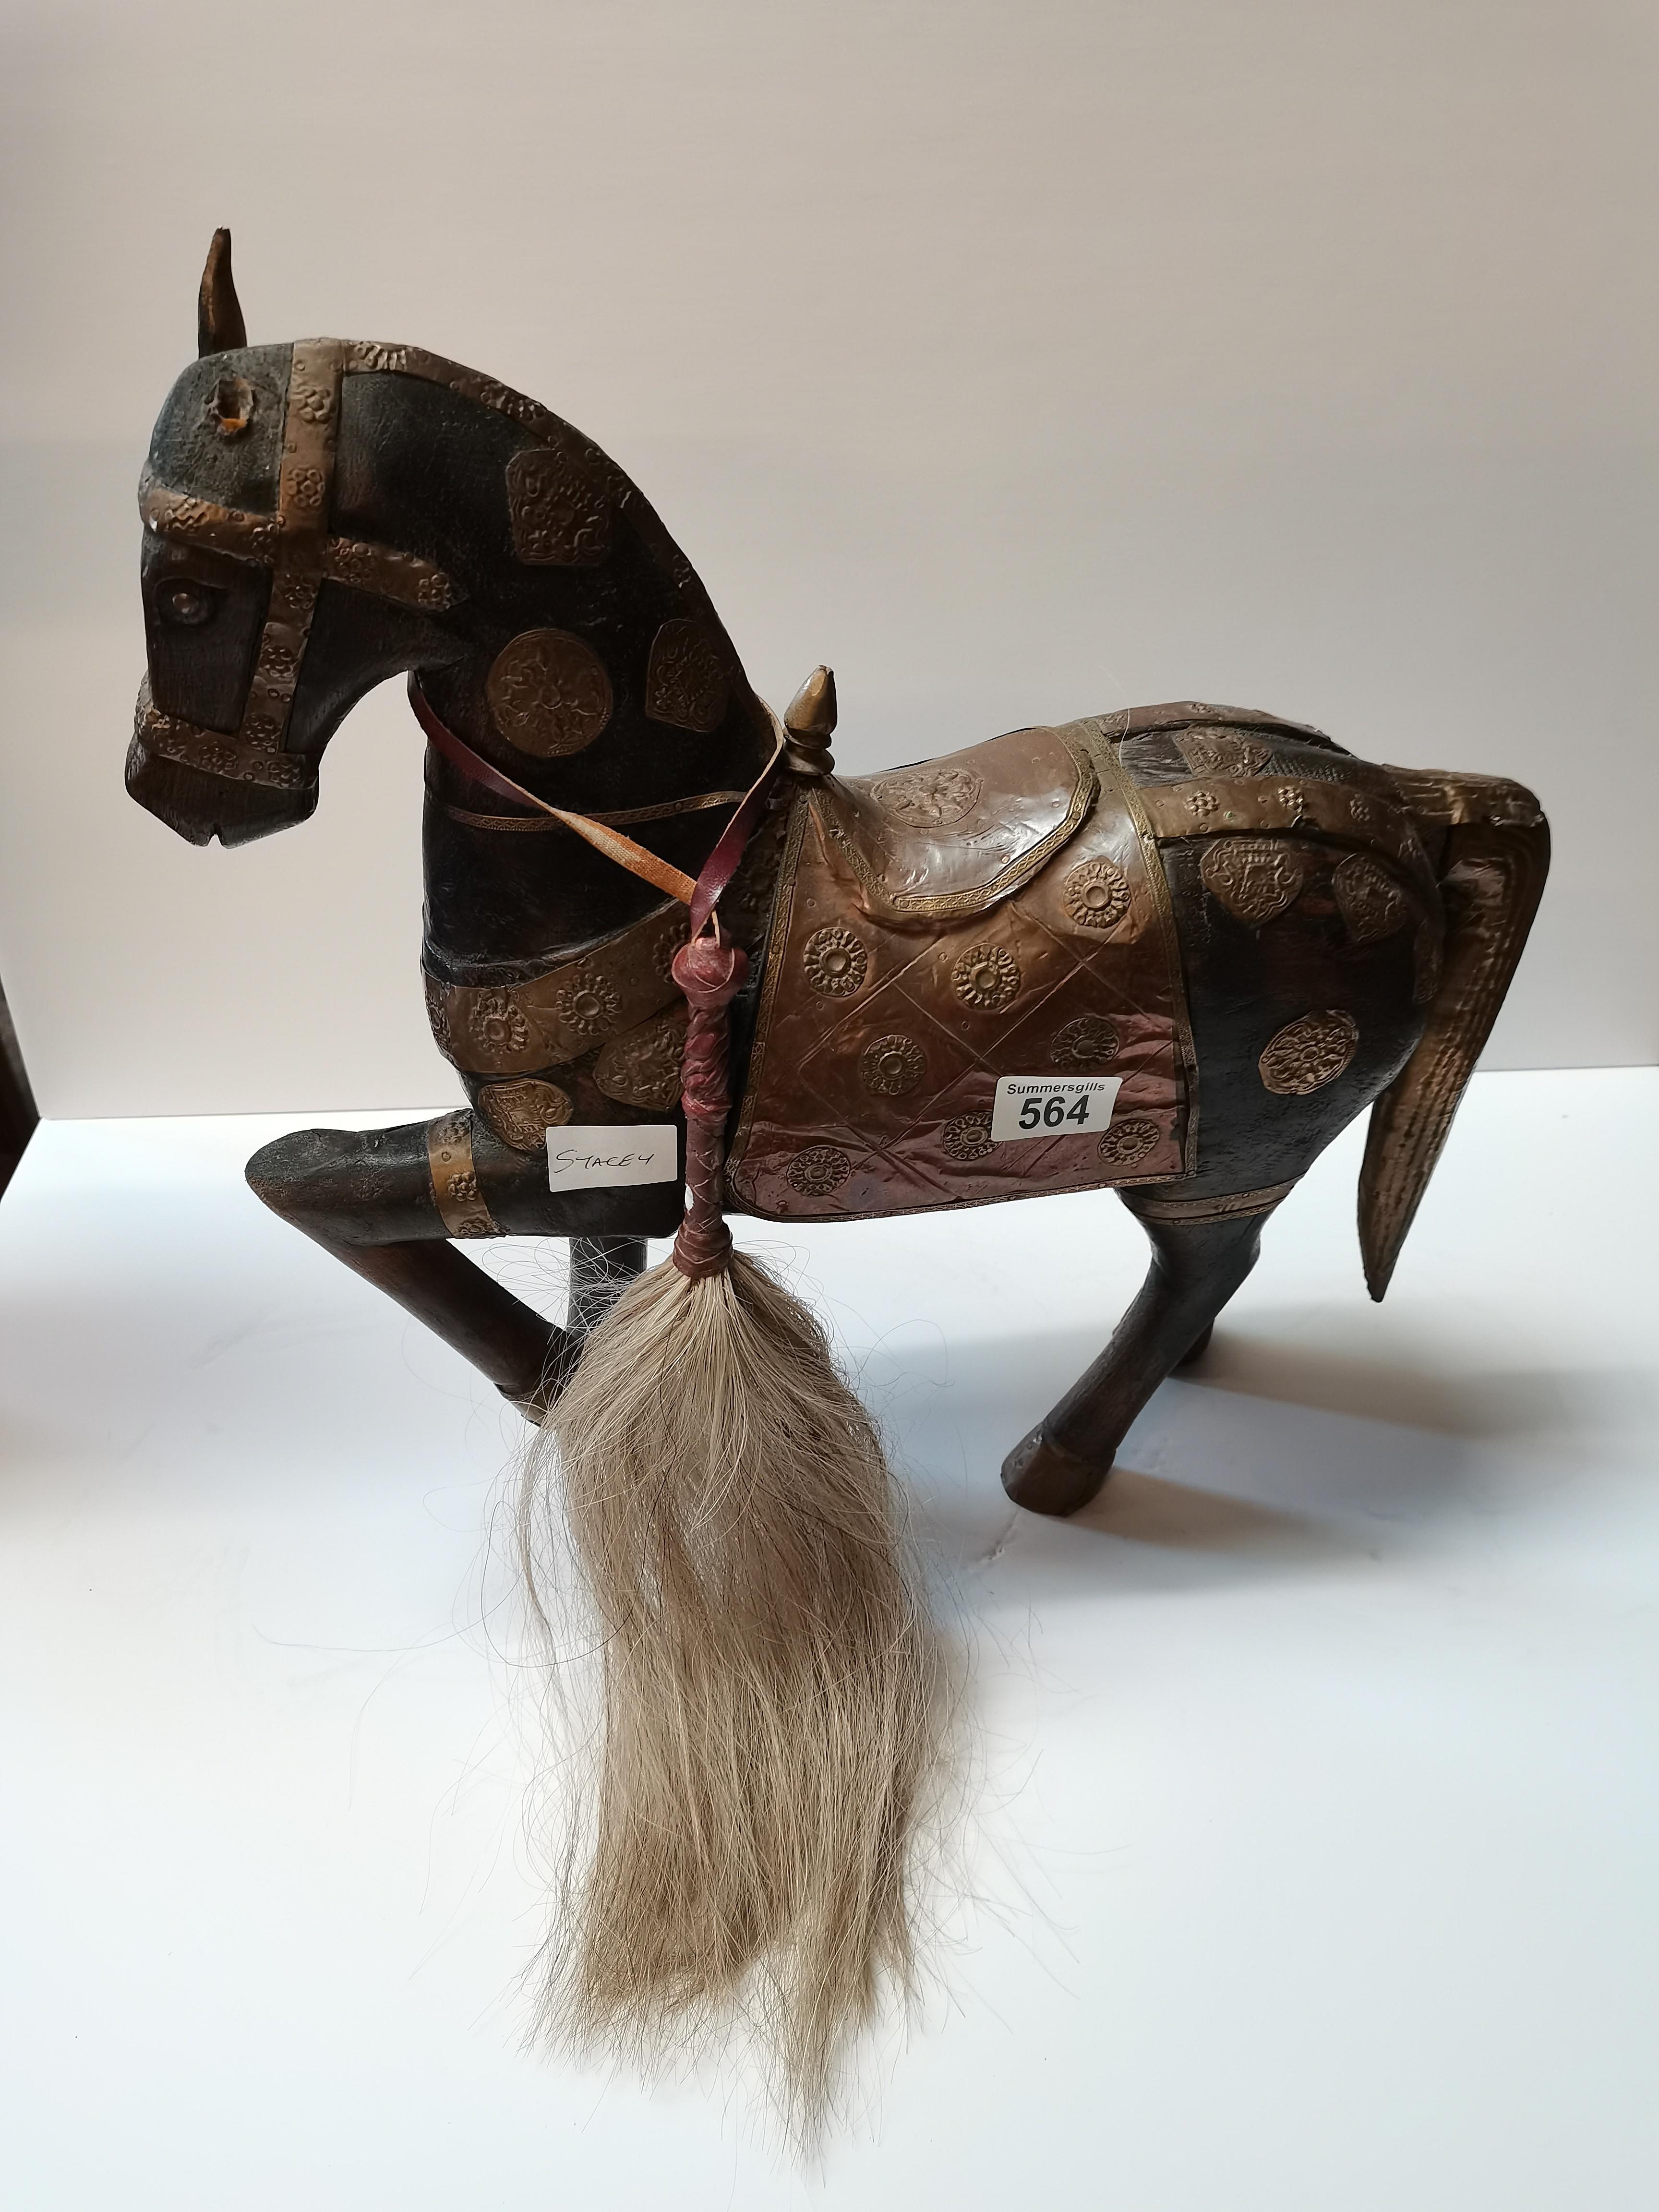 Eygptian style horse figure